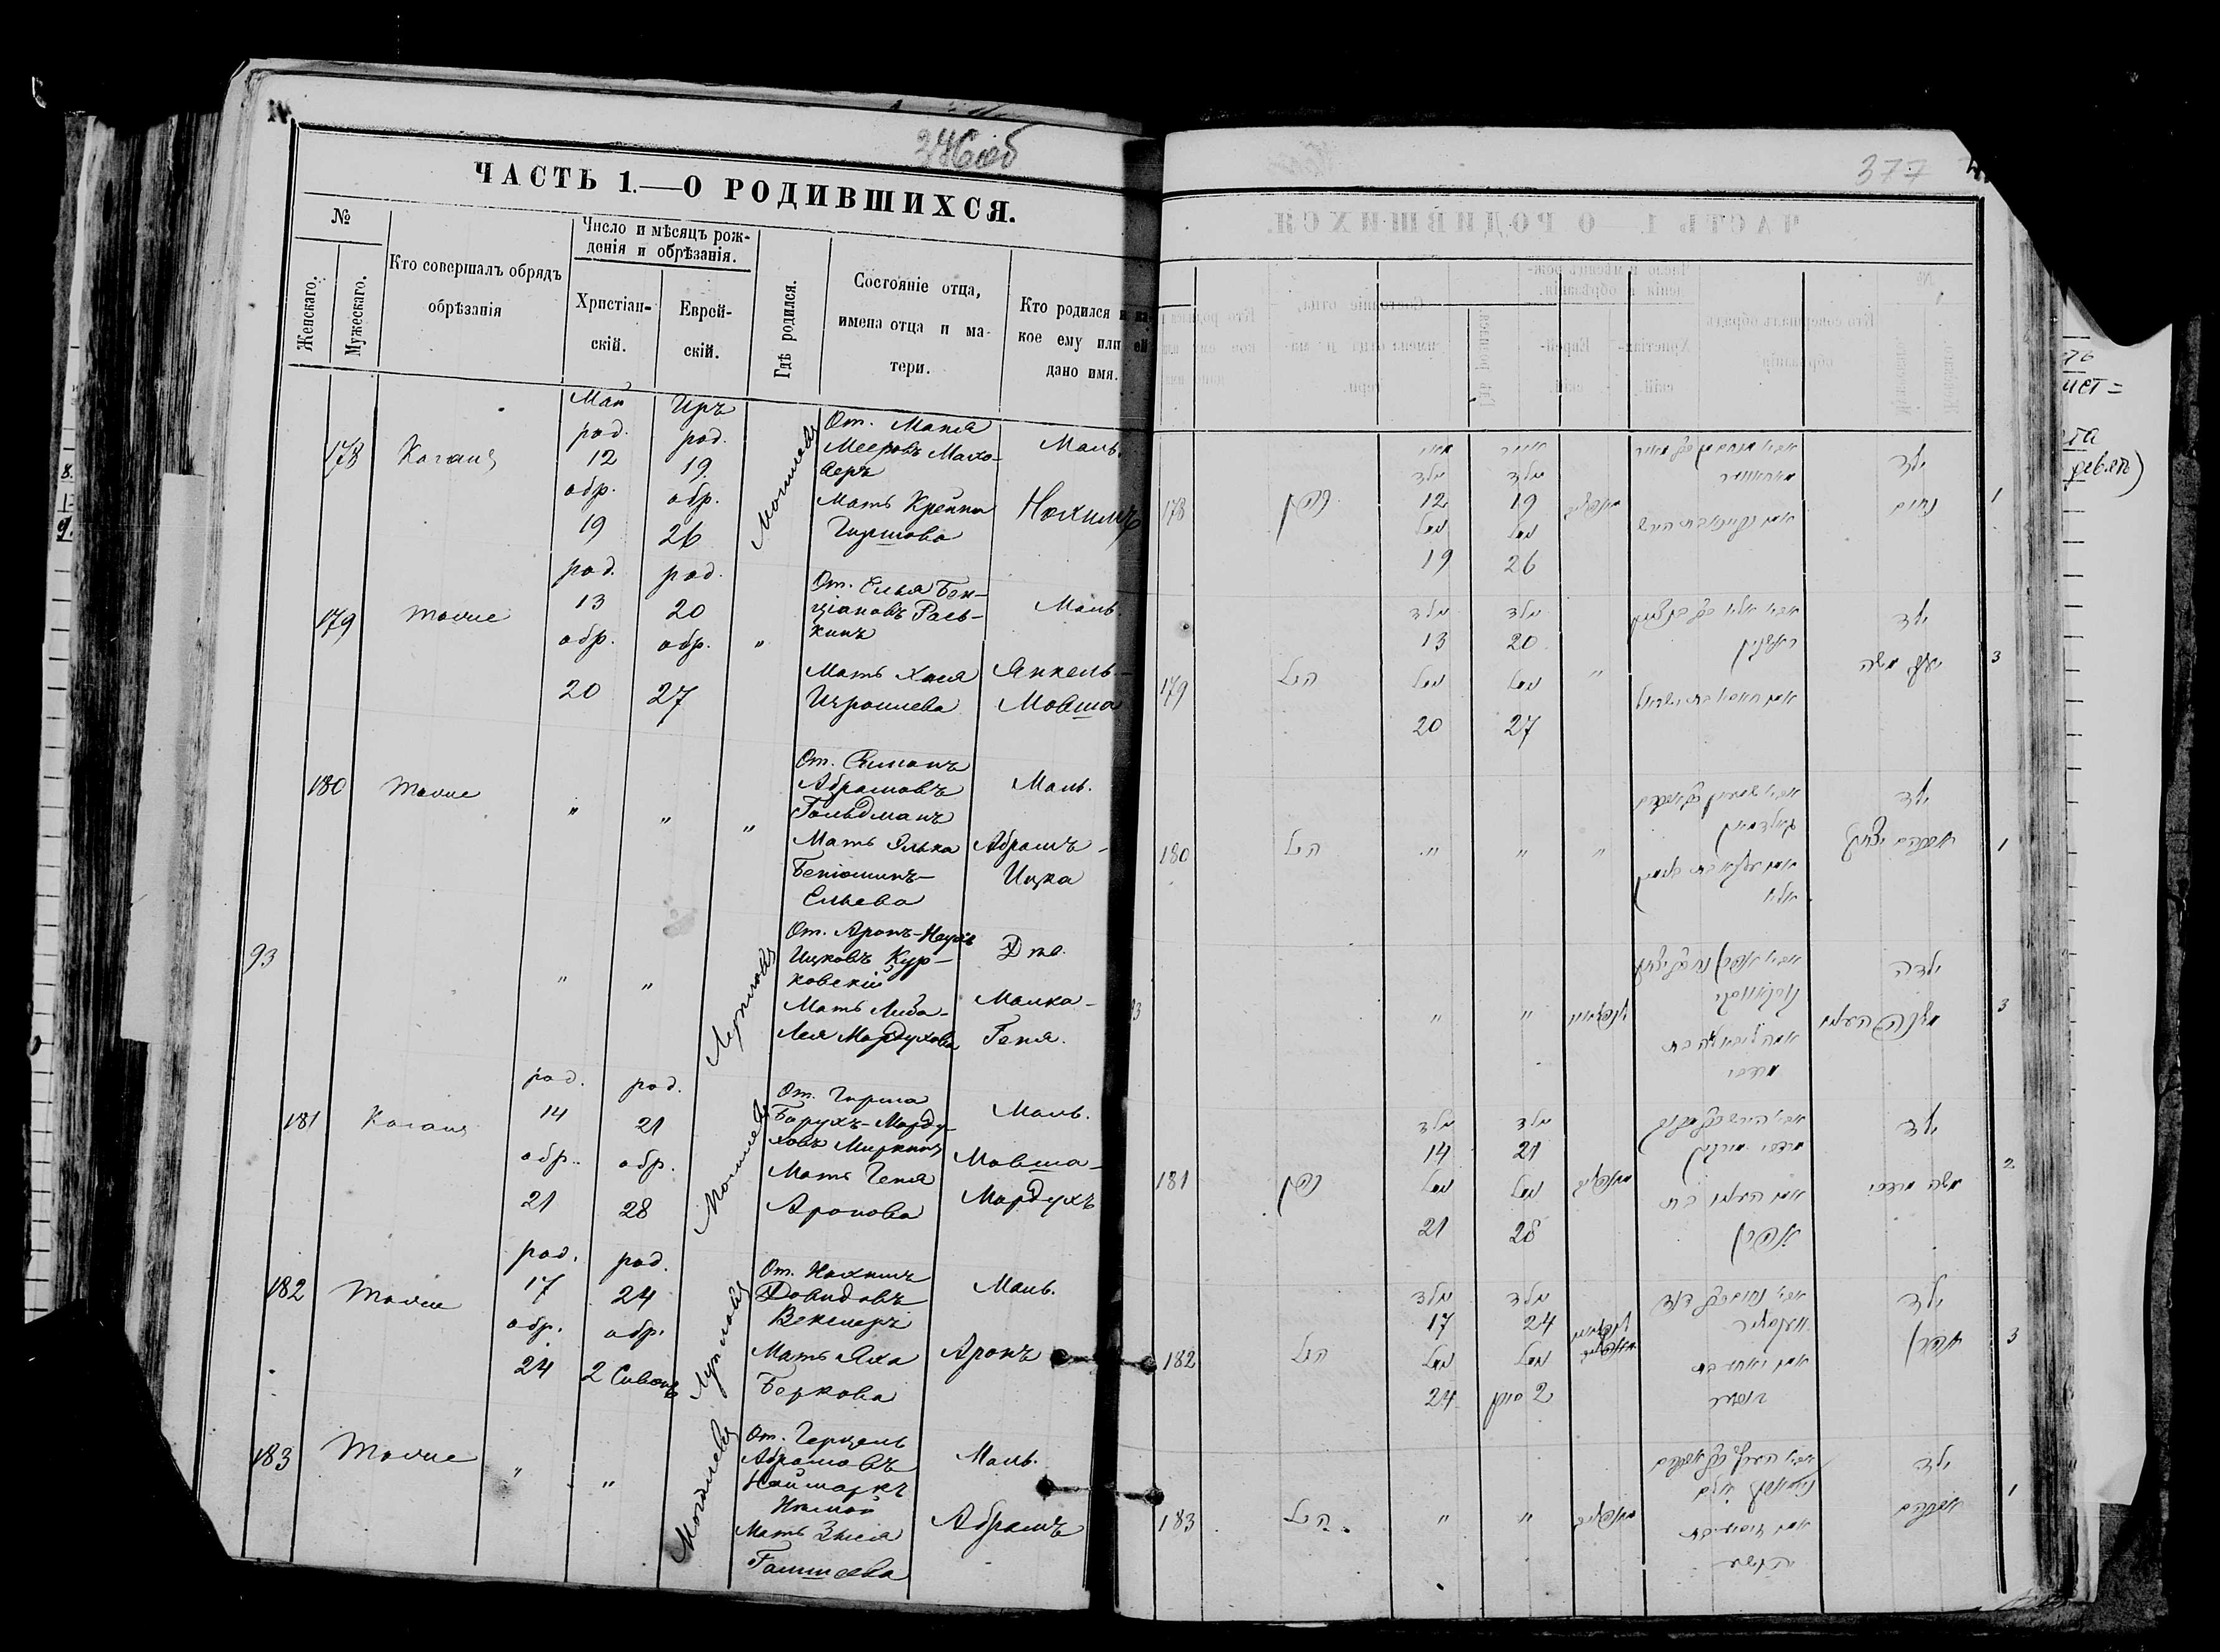 Мовша-Мордух Гиршенович Миркин 14 мая 1875, запись 181, пленка 007766481, снимок 49